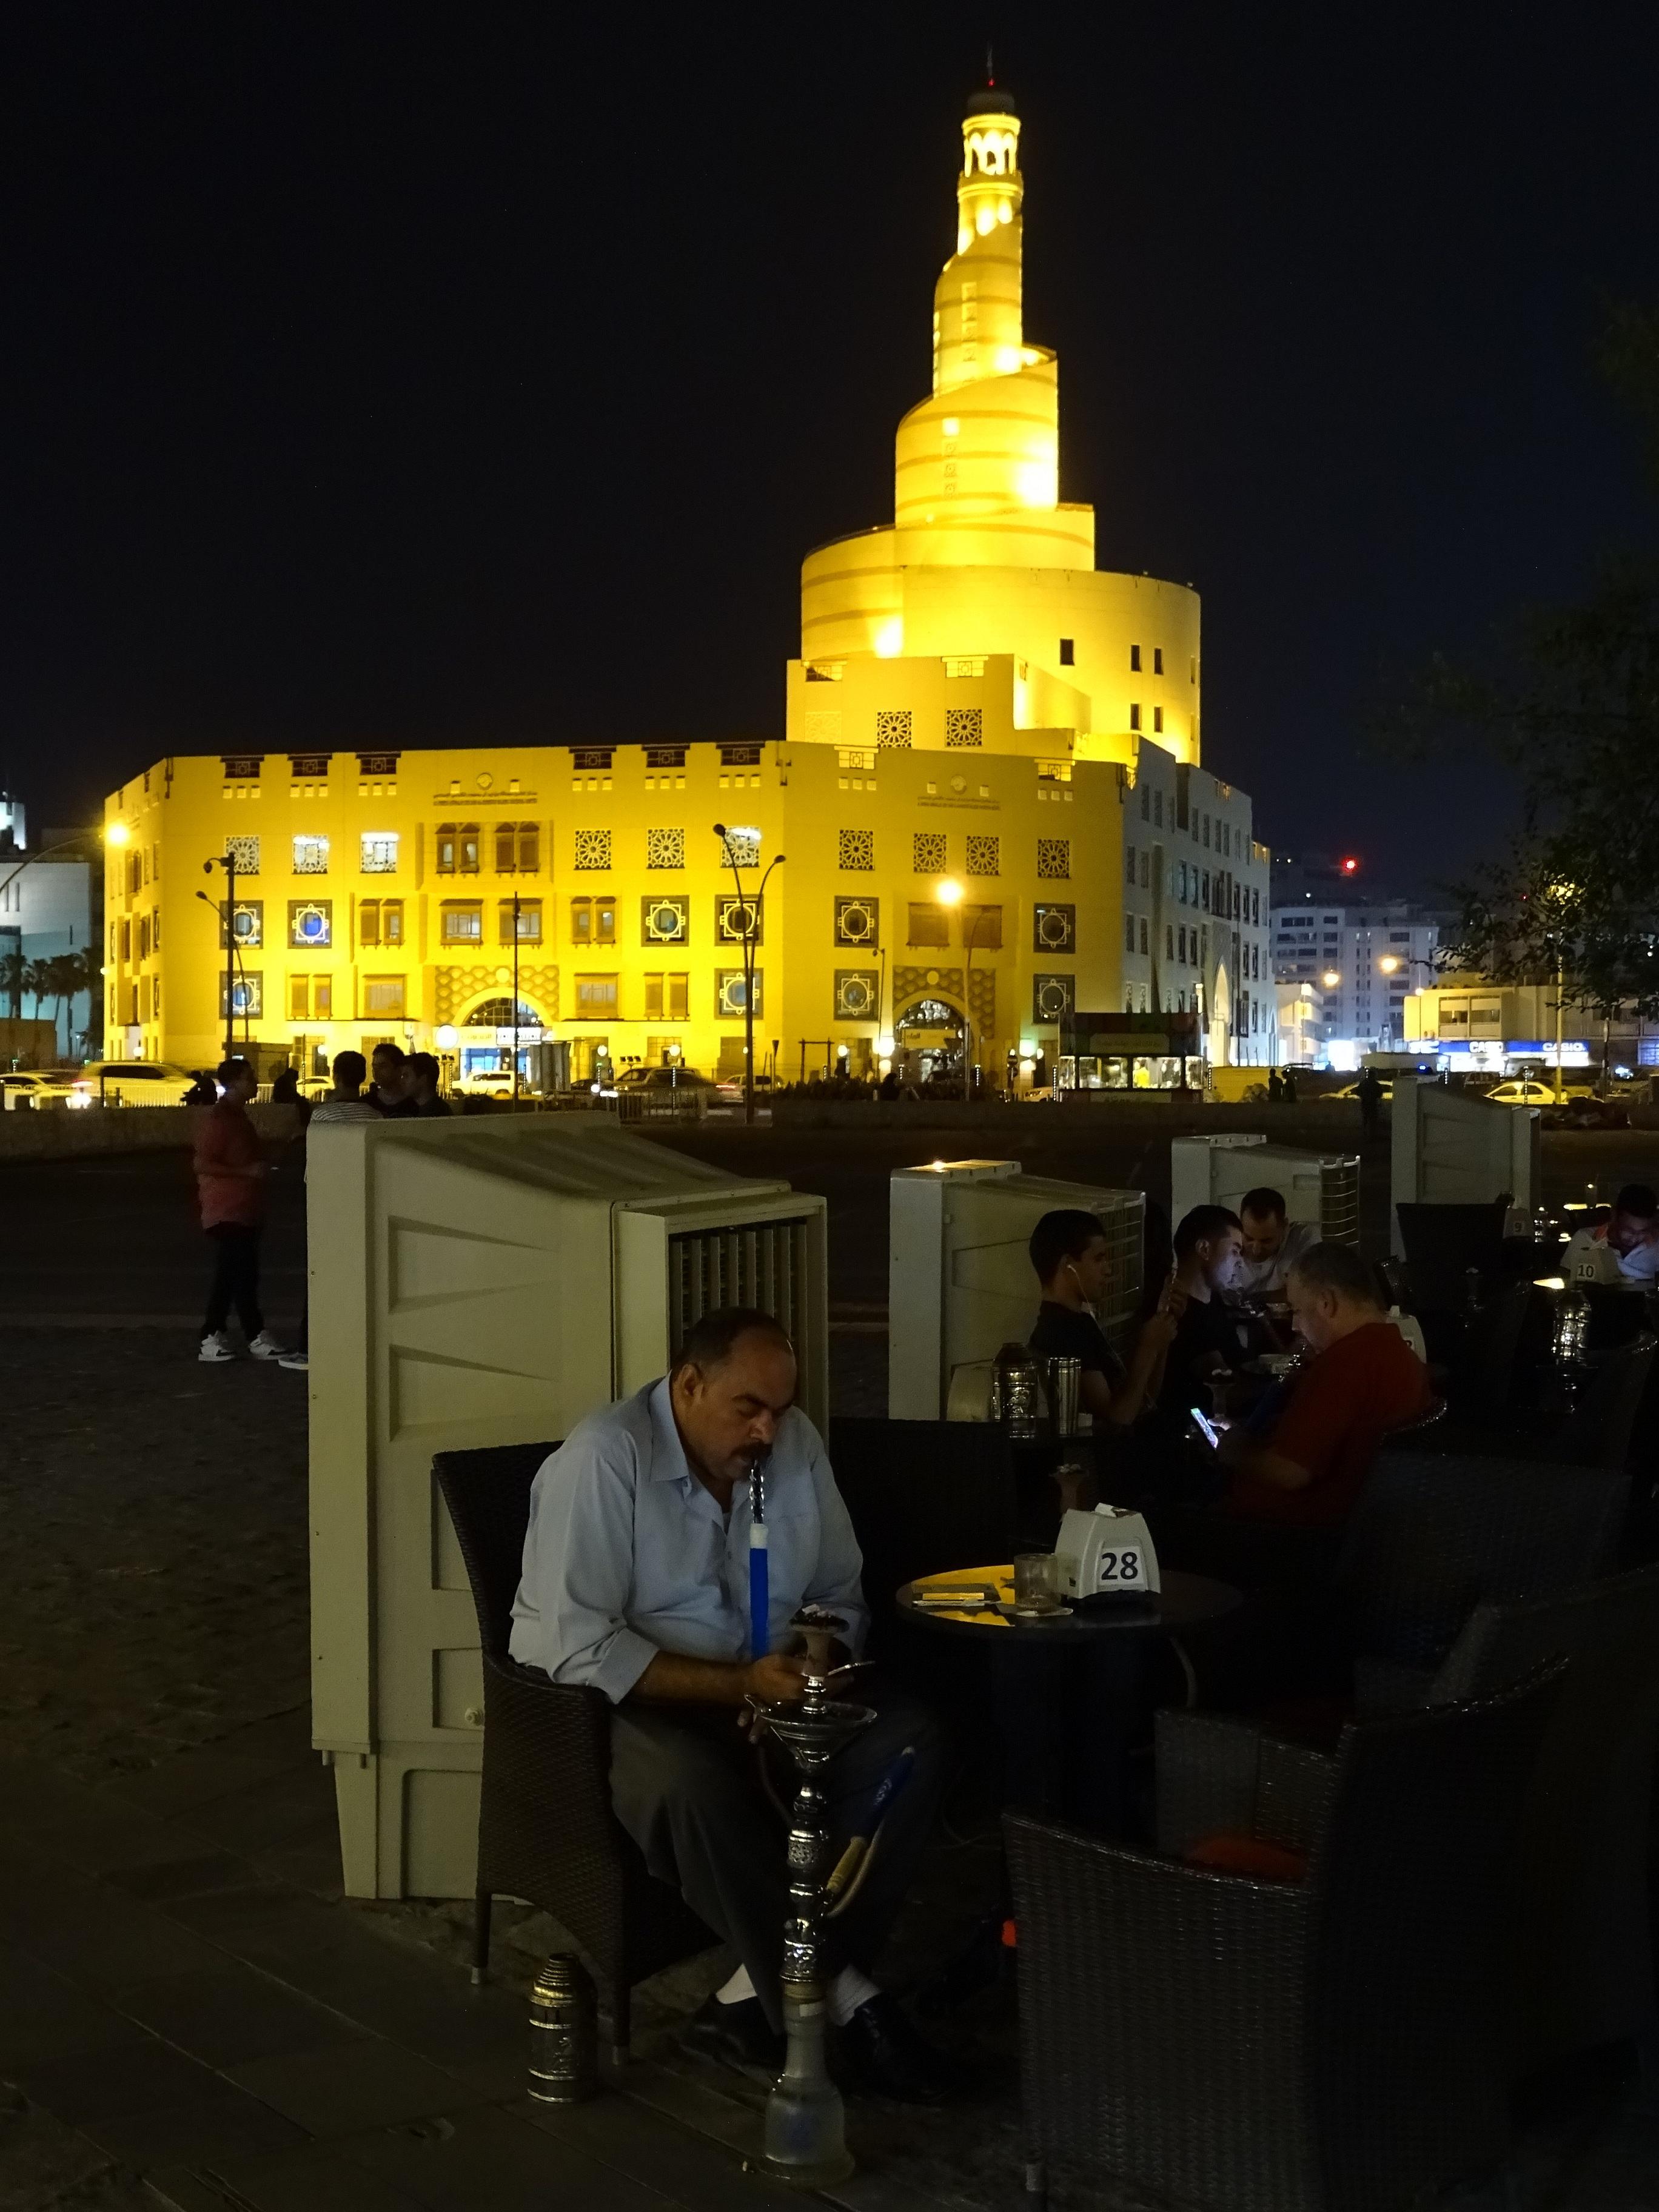 File:Doha by Night - Souq Waqif - Doha - Qatar - 02 (34503560681